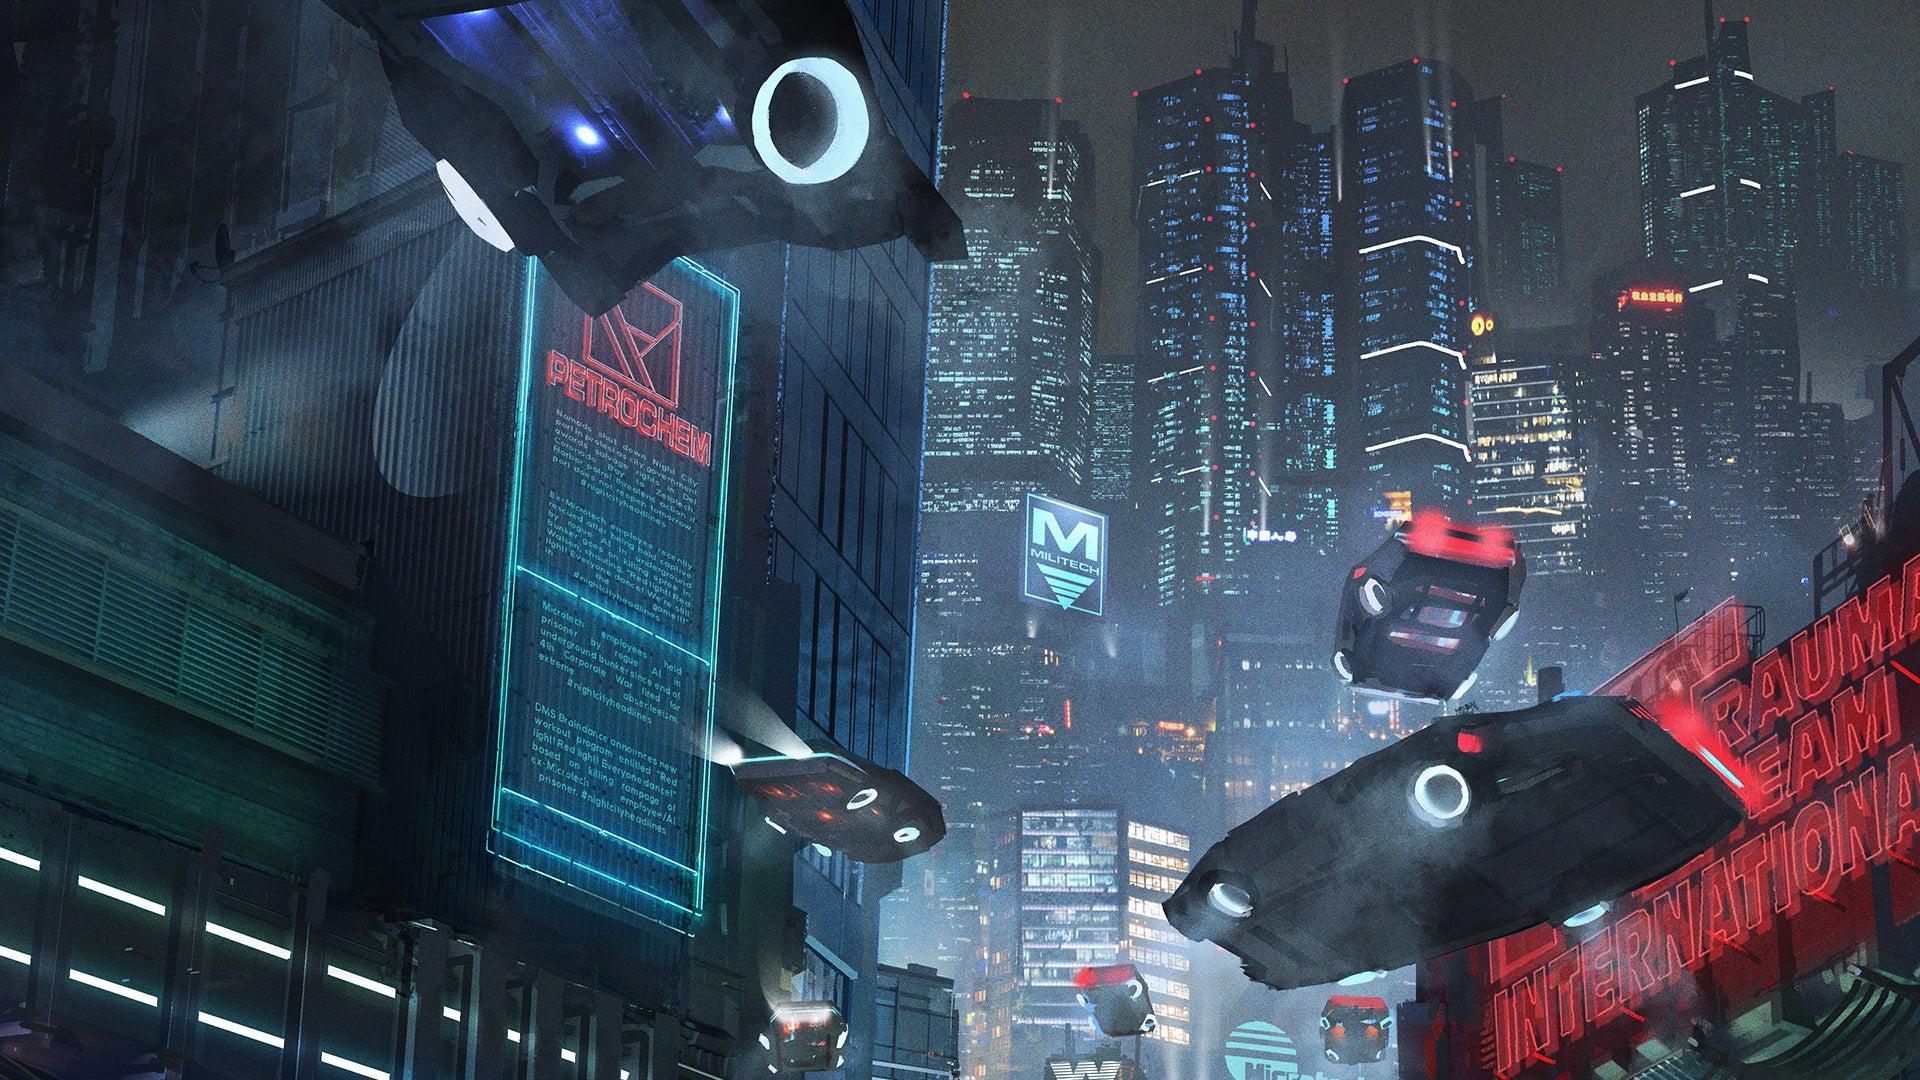 cyberpunk-red-rpg-artwork-taxi.jpg